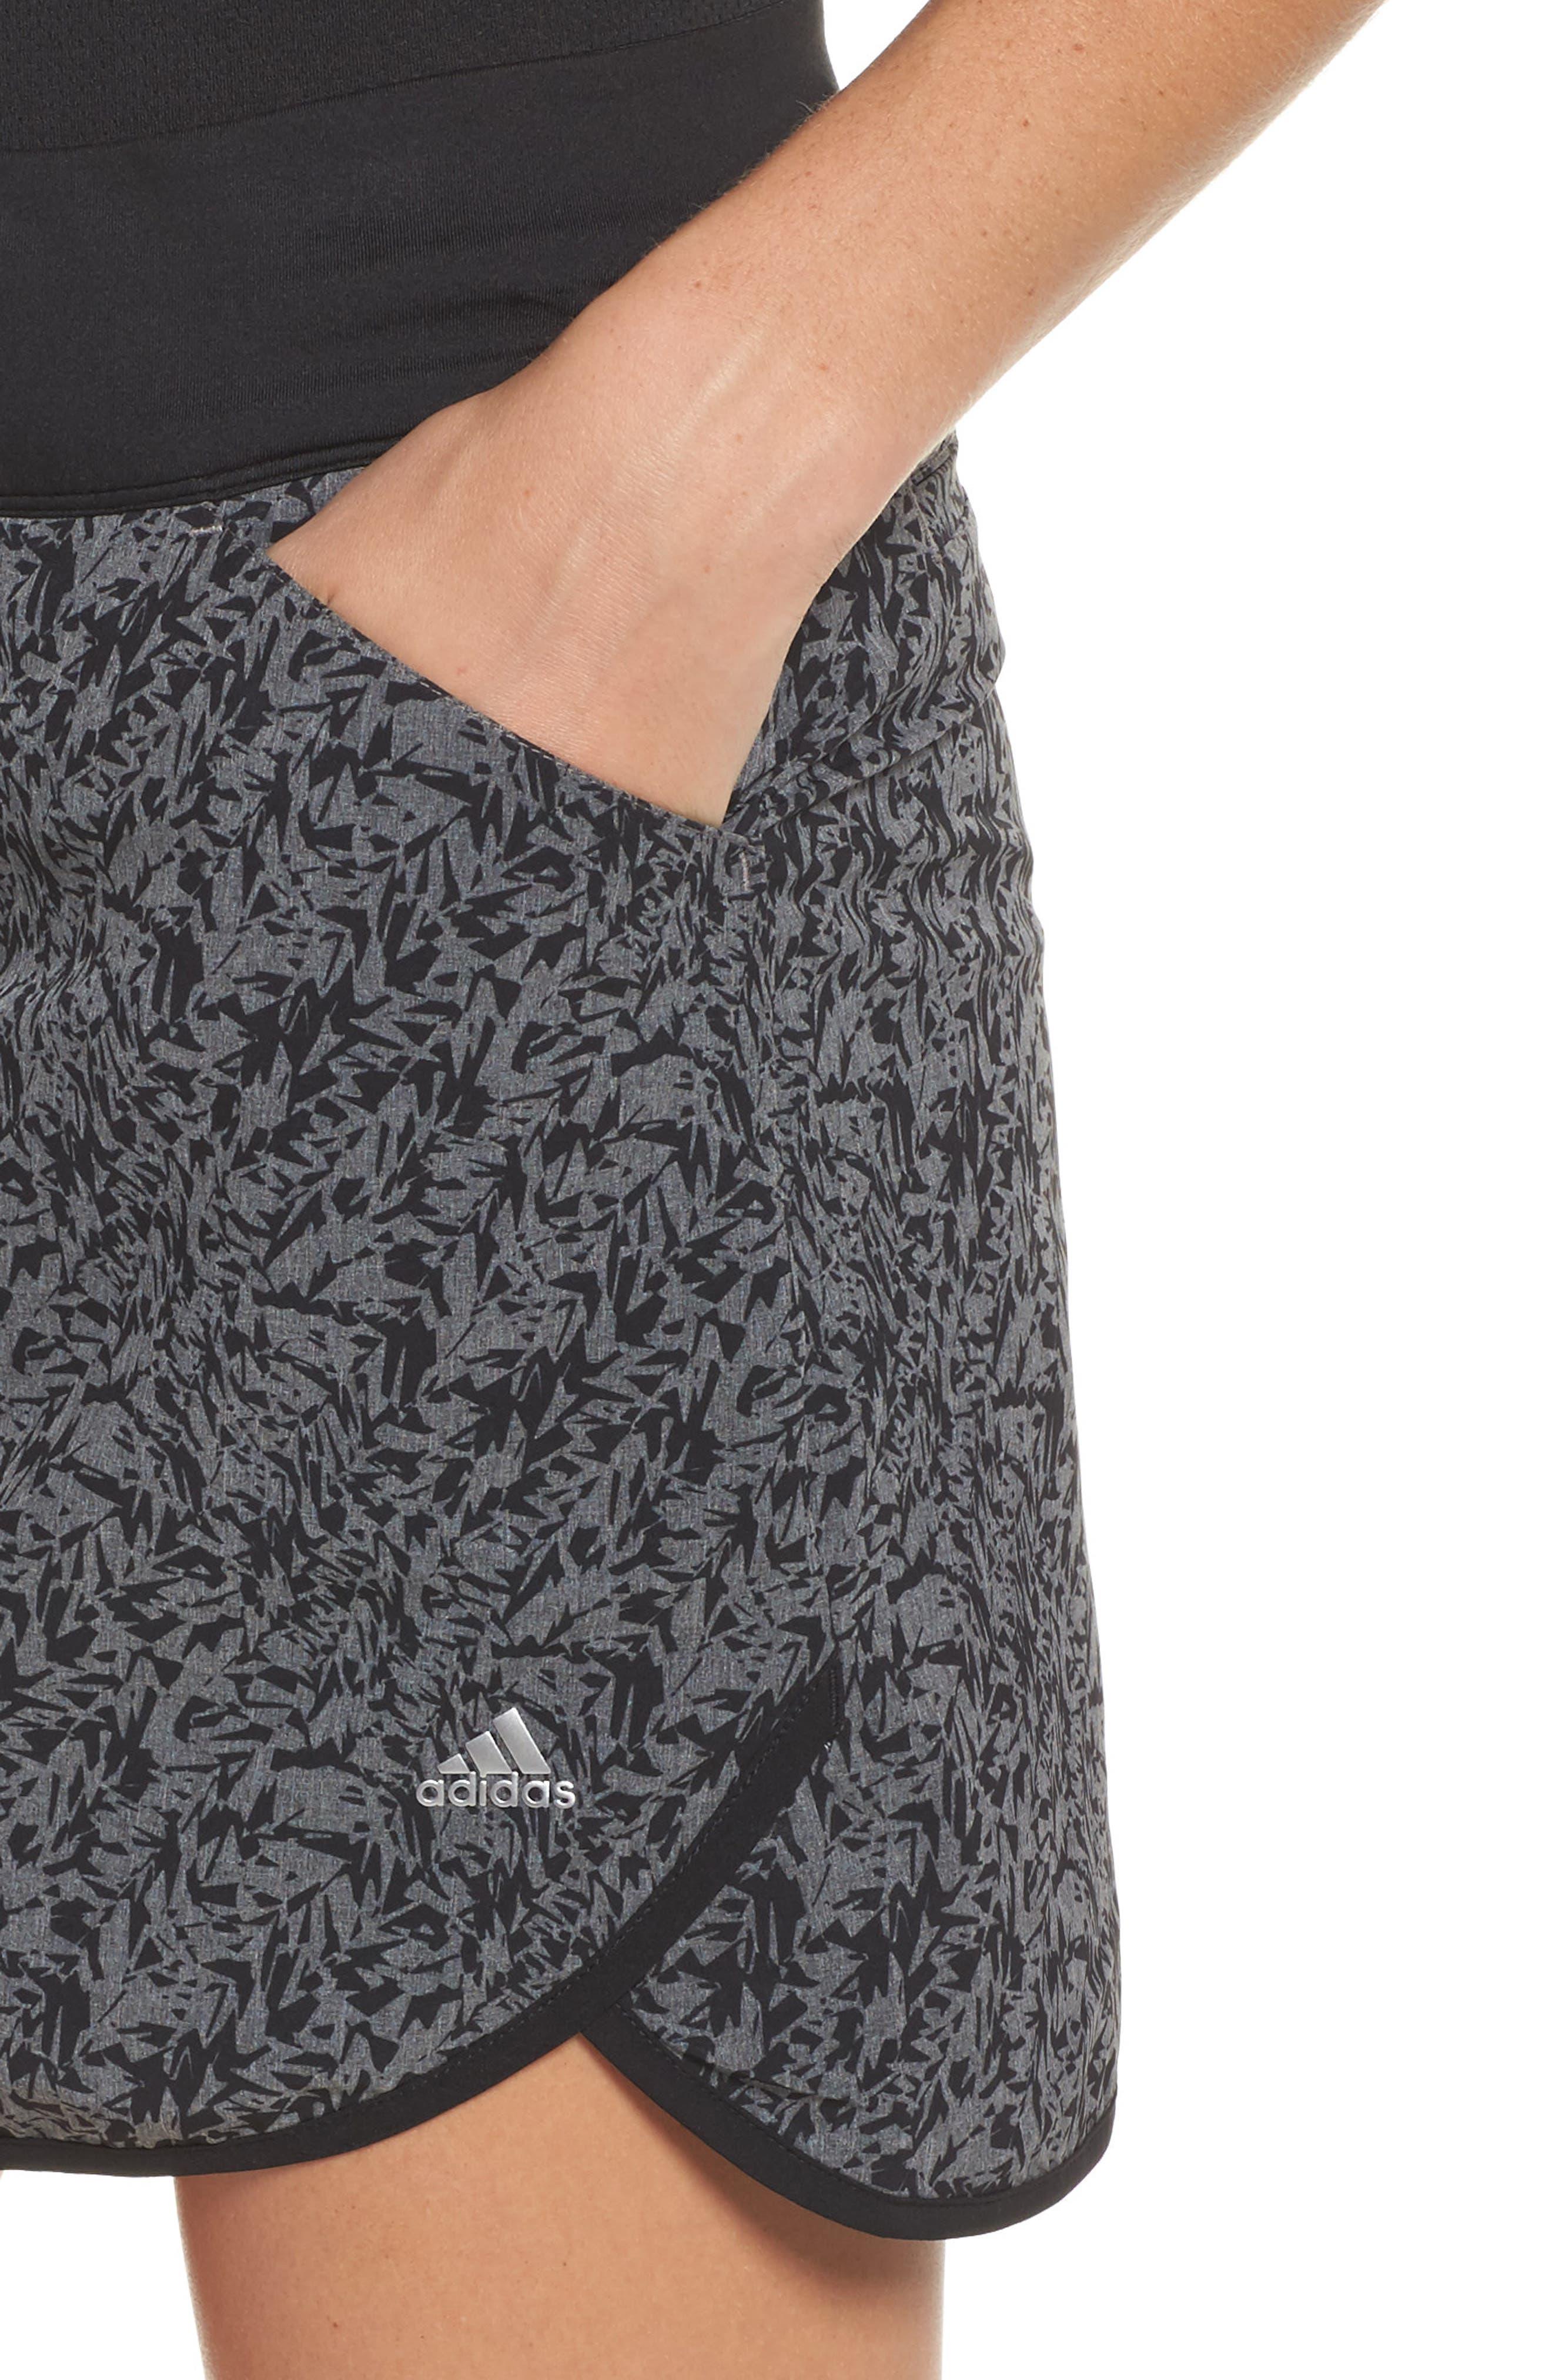 Rangewear Skort,                             Alternate thumbnail 4, color,                             Black